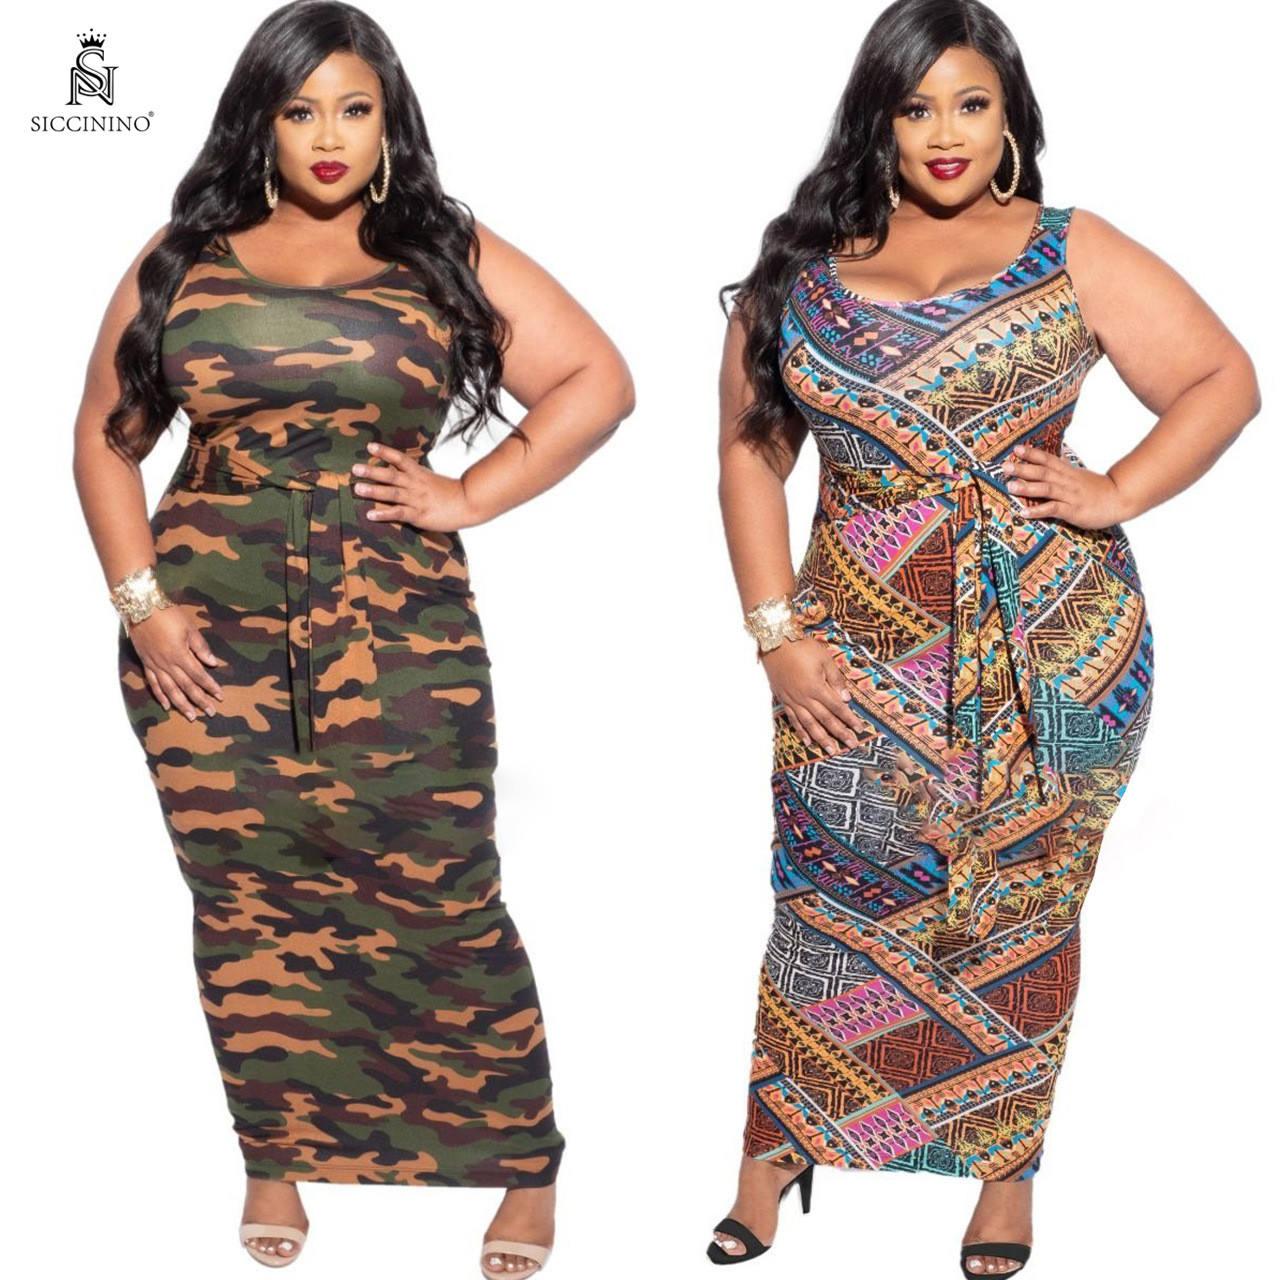 2021 new design factory price wholesale women's casual 5XL plus size dresses summer